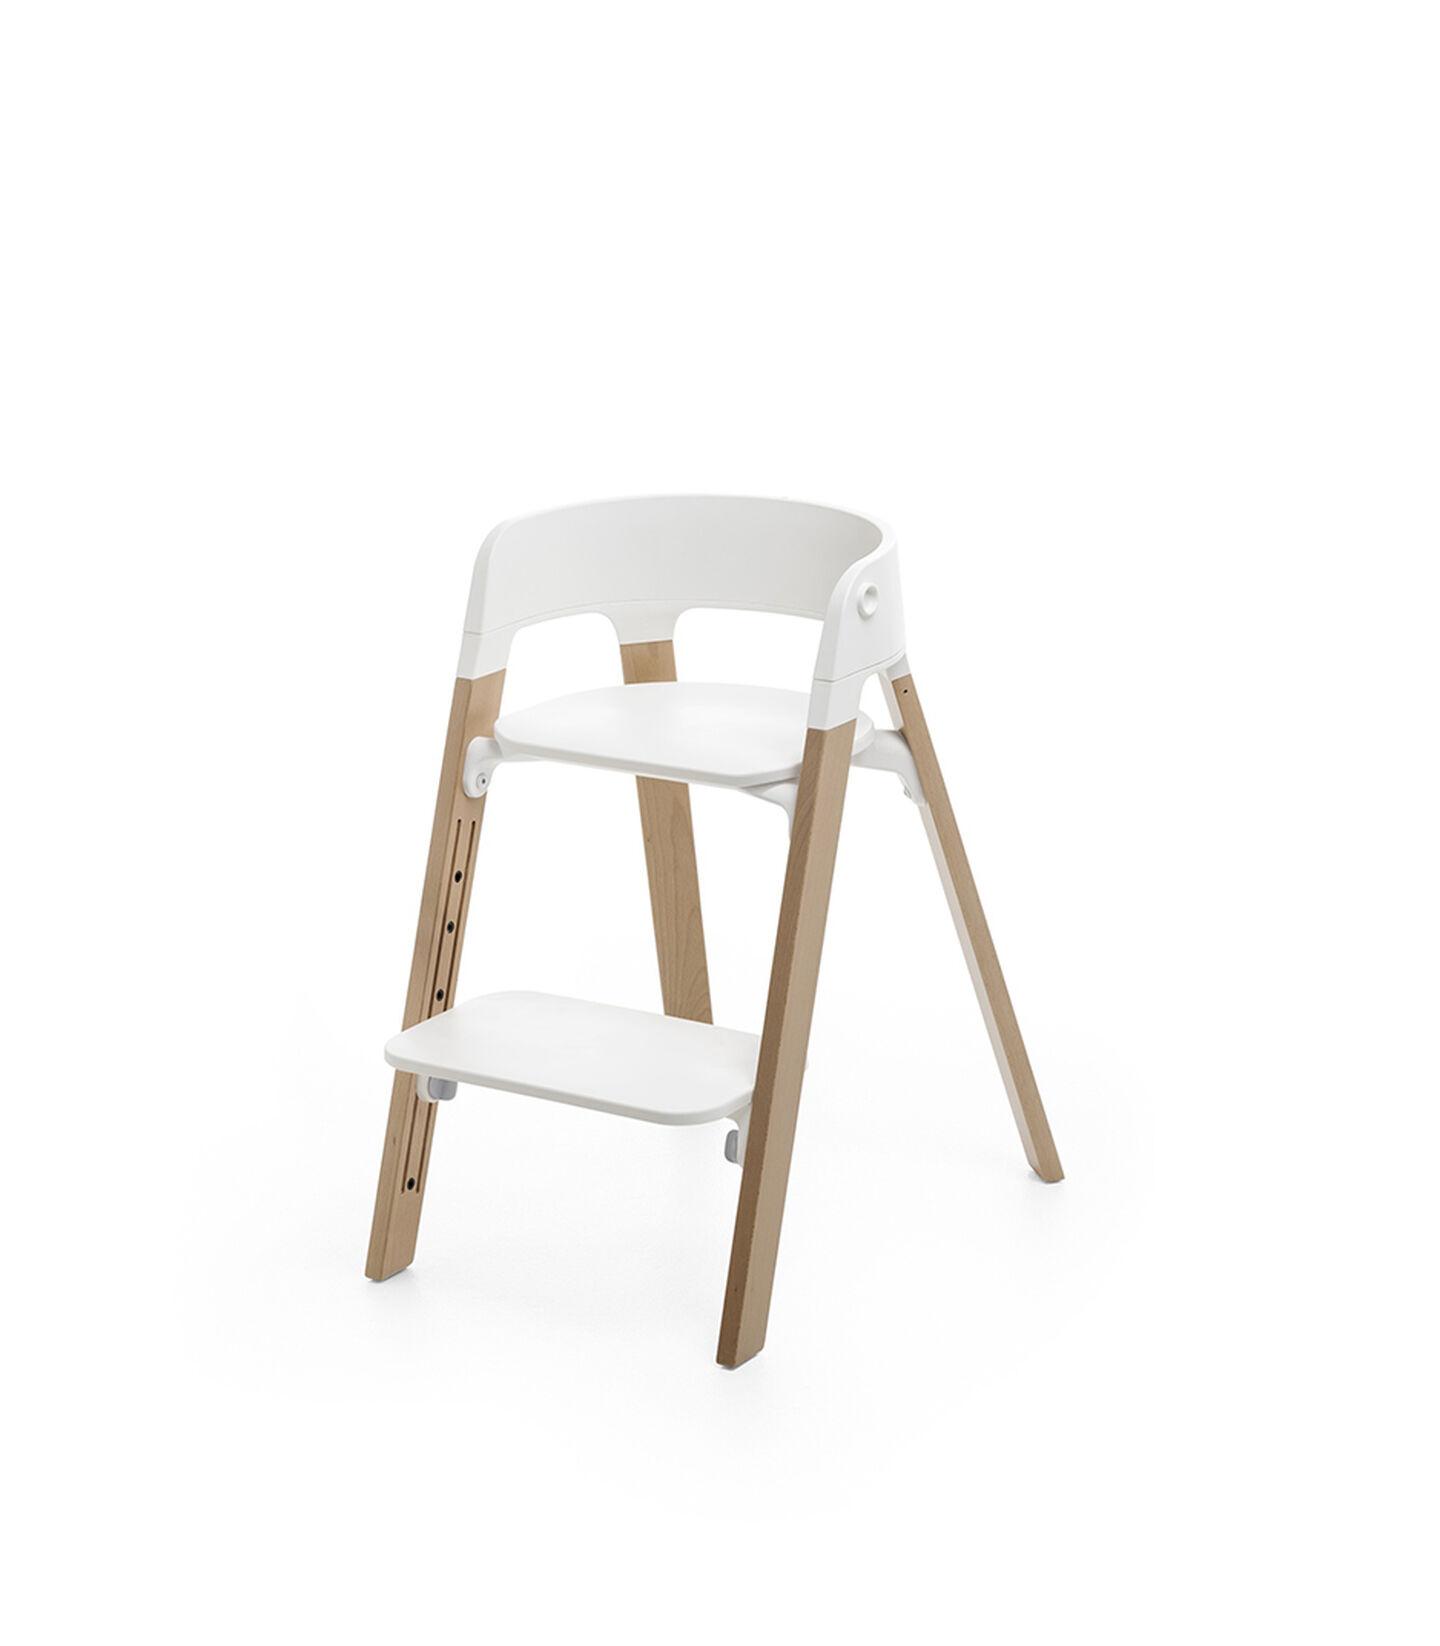 Stokke® Steps™ Chair White Oak, White/Natural Oak, mainview